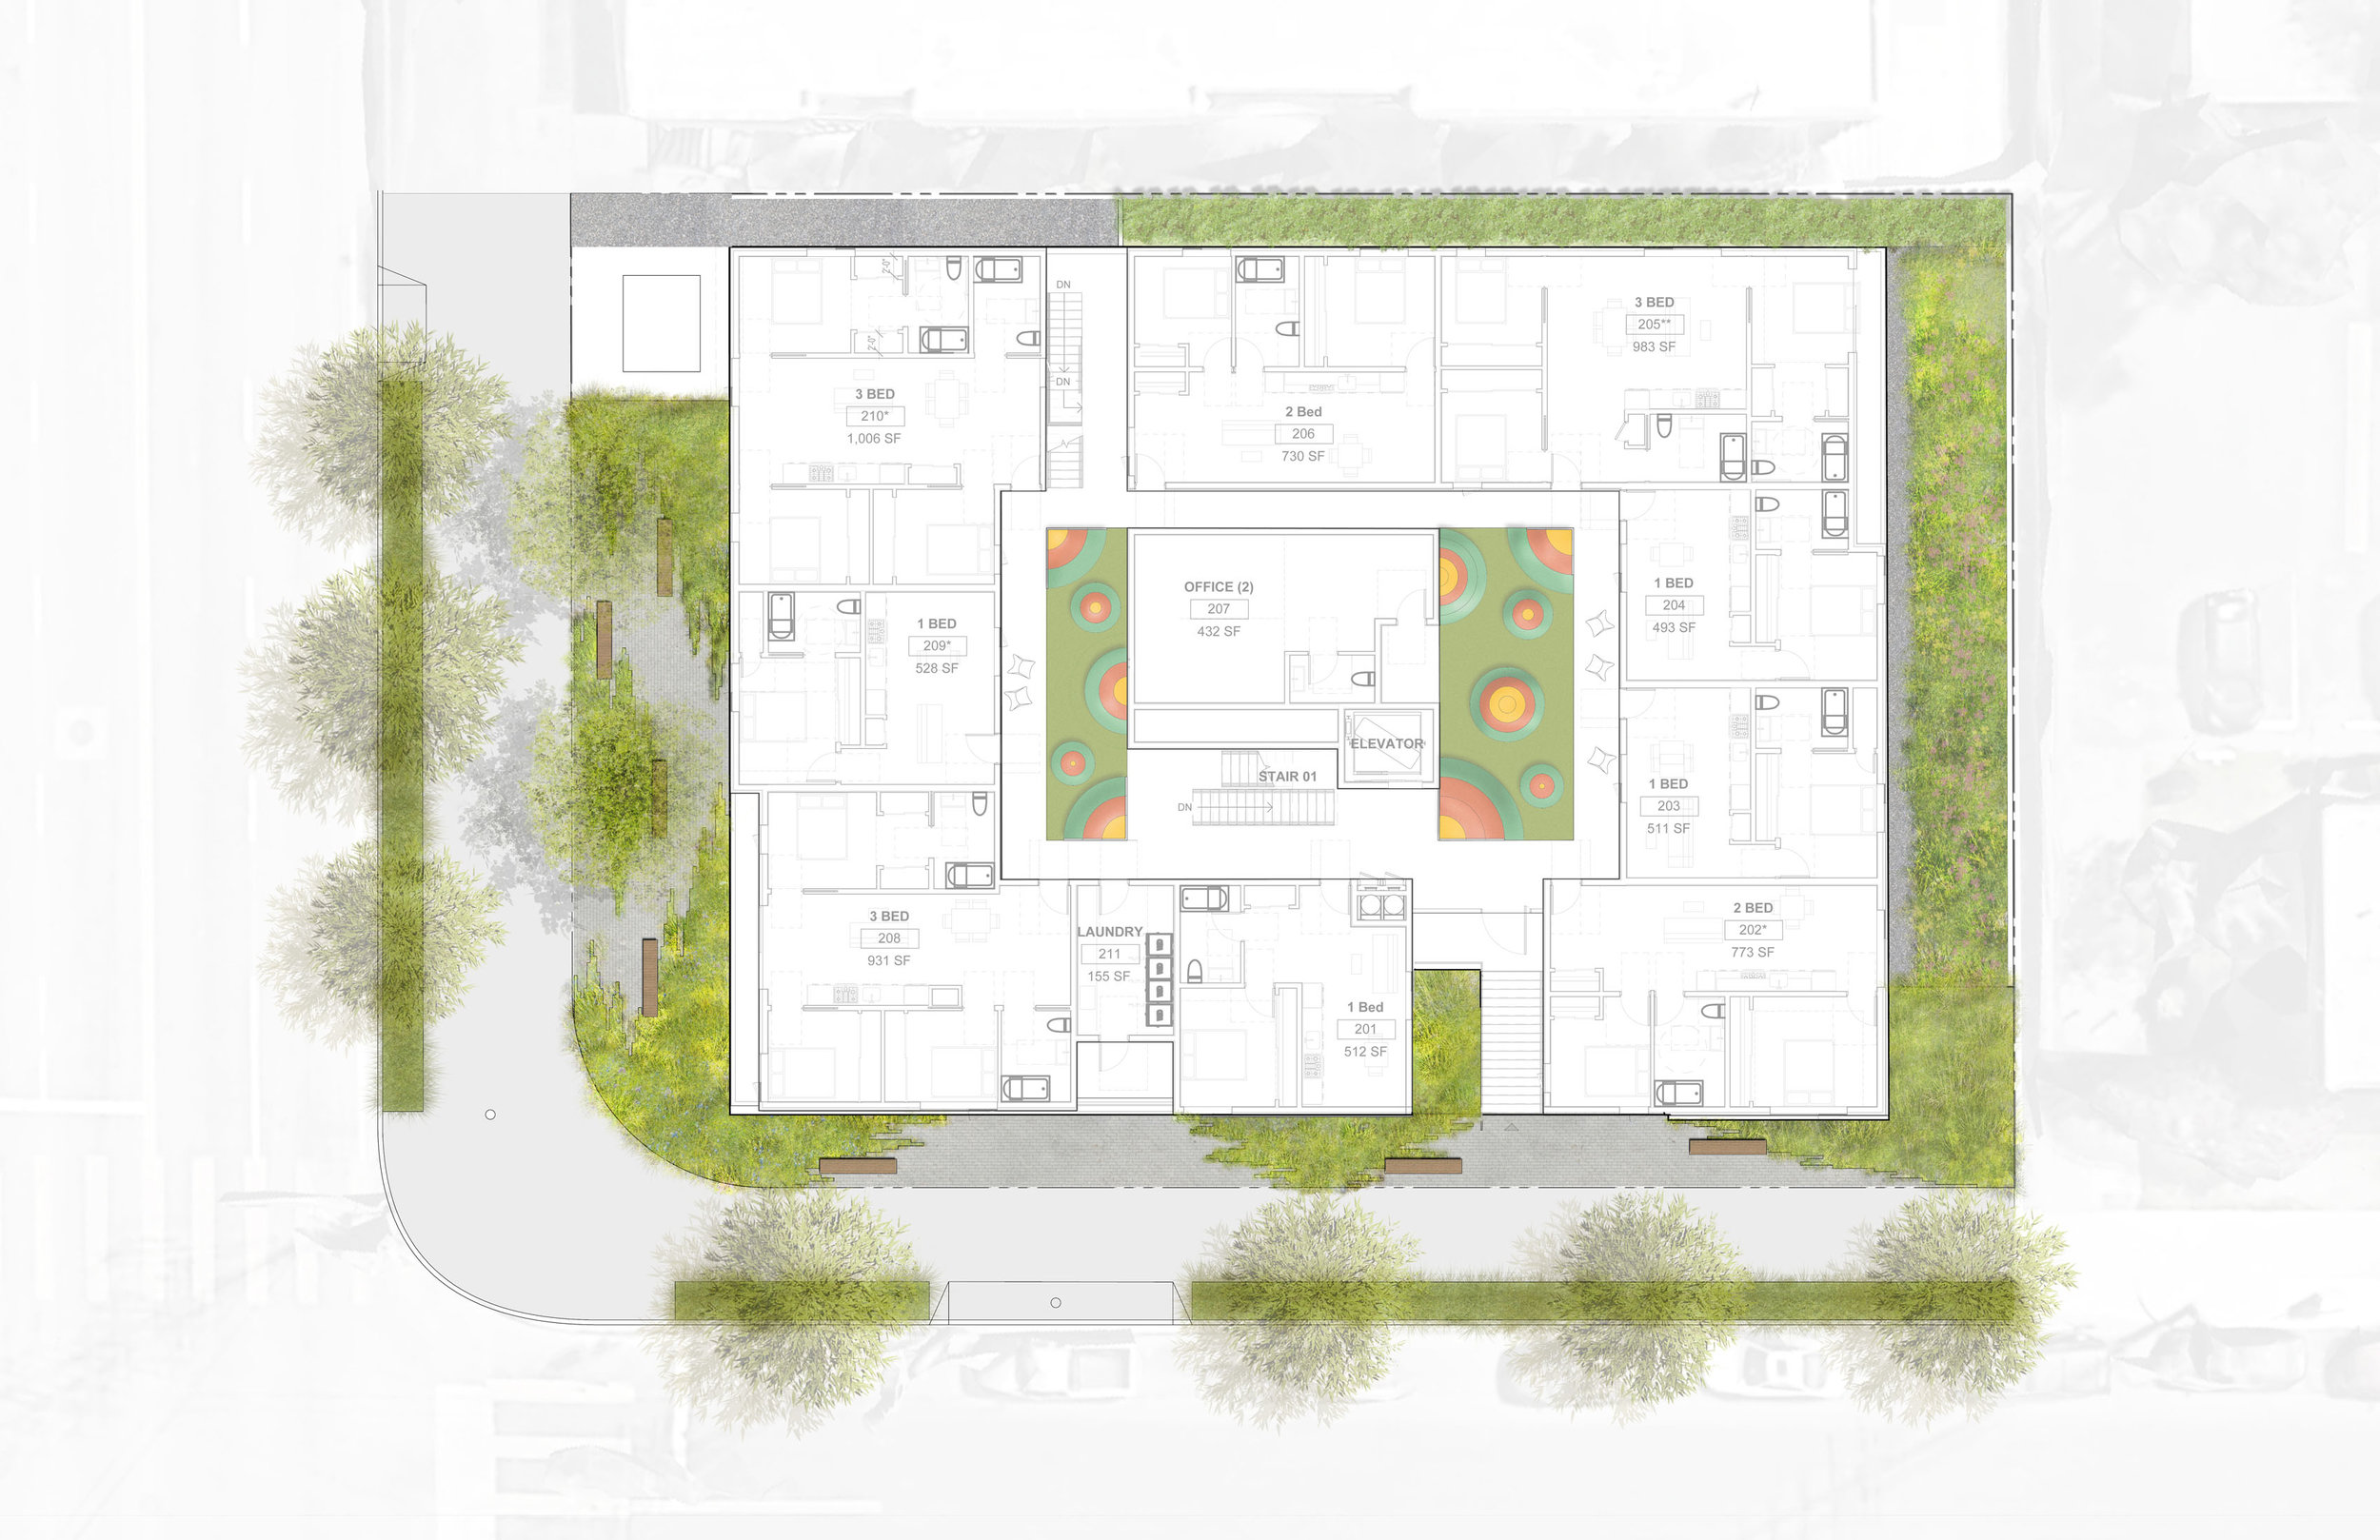 TINA CHEE landscape studio-SUNKING-site plan.jpg